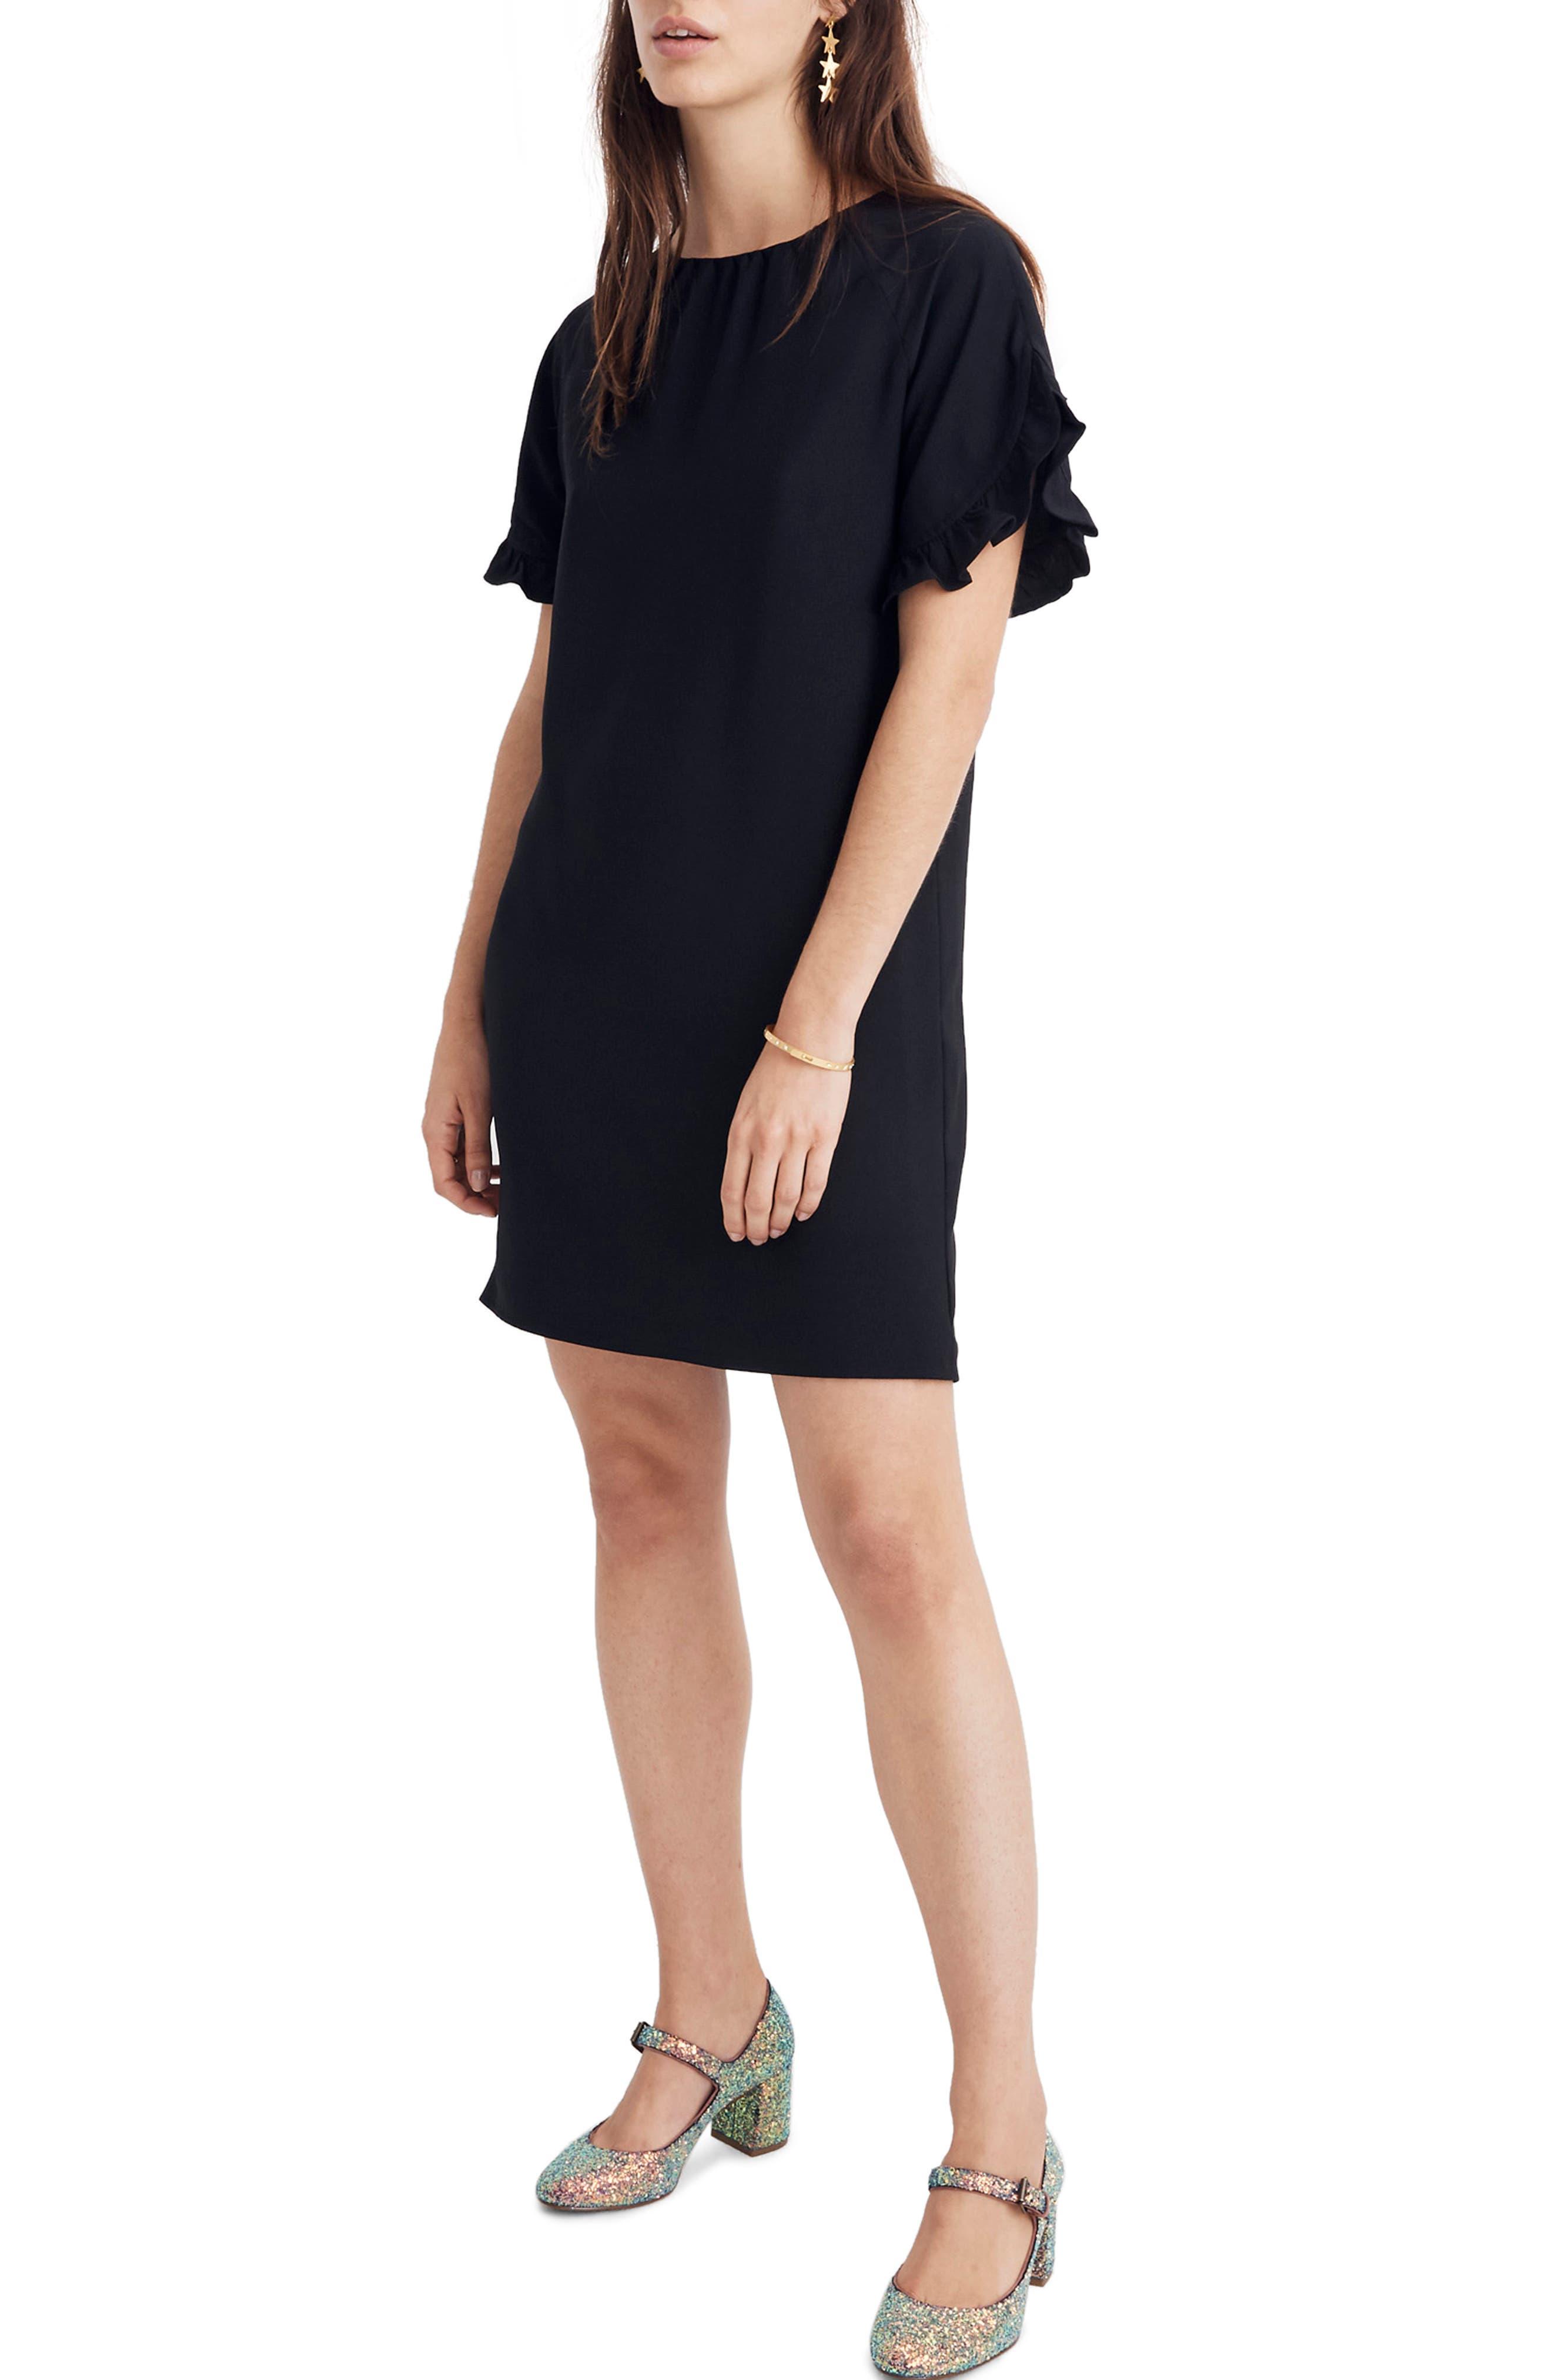 Madewell Memento Ruffle Sleeve Dress, Black